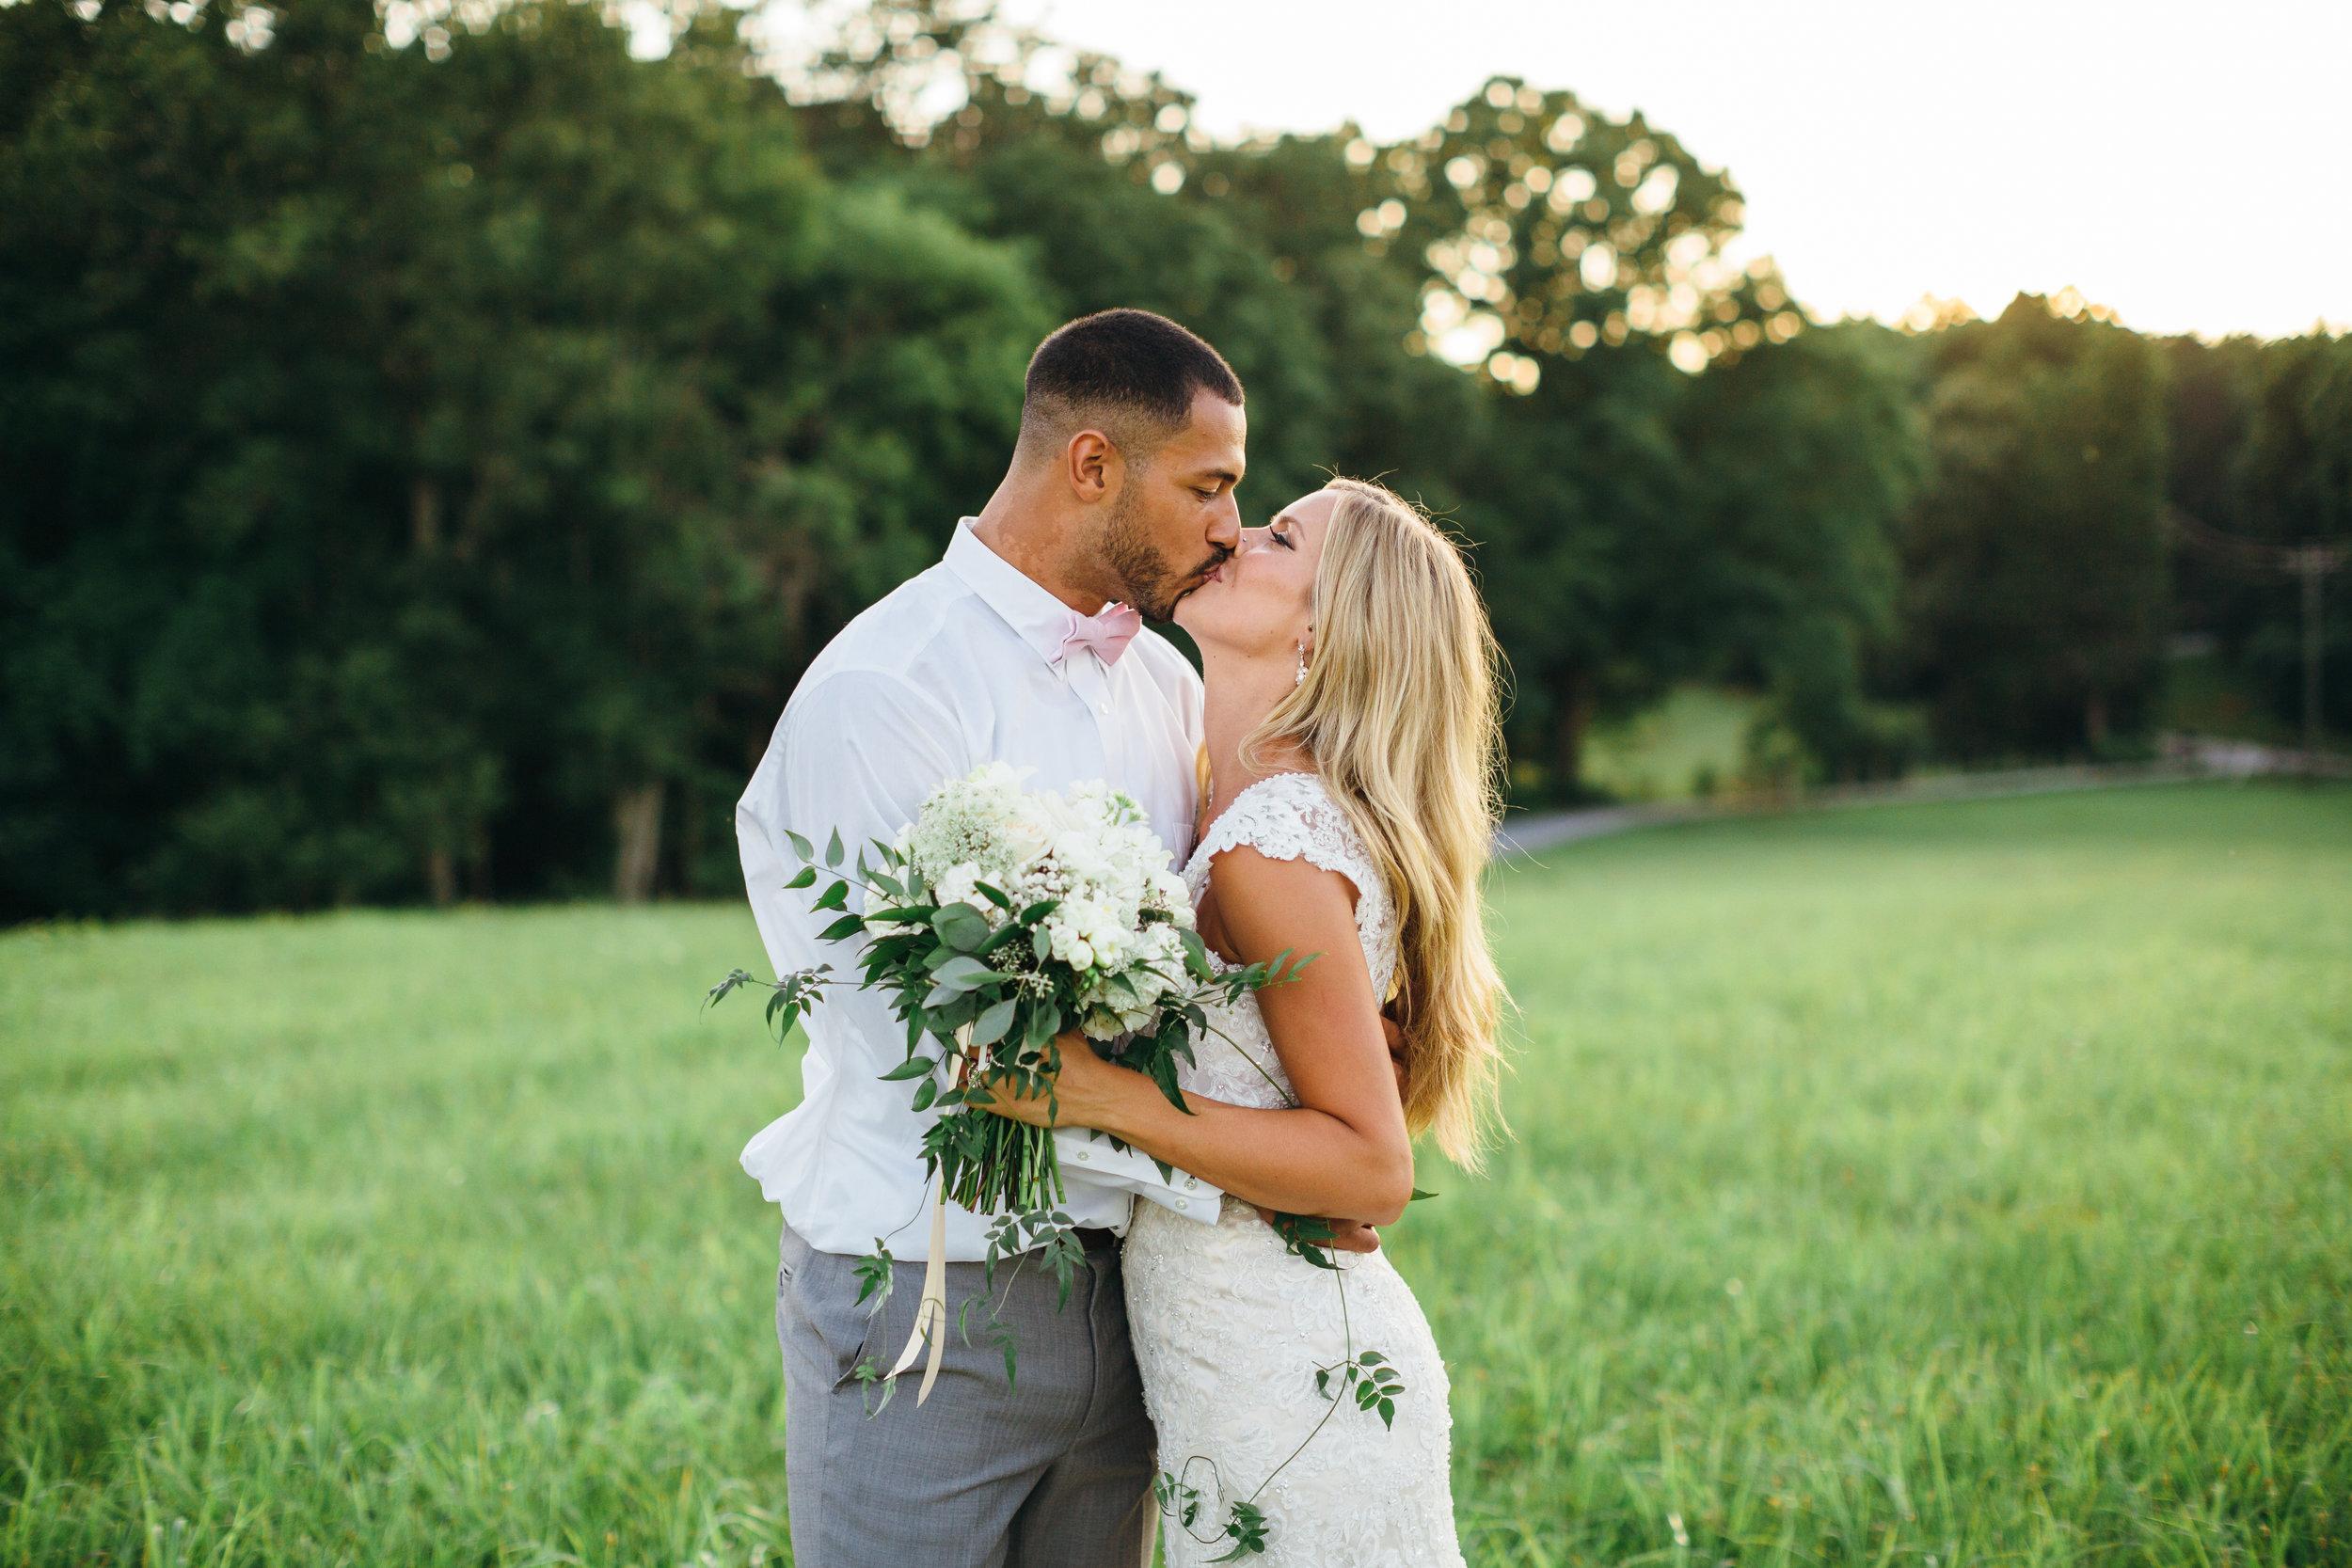 Lynchburg Wedding Photographer; Lynchburg Photographer; Lynchburg Wedding; Sorella Farms Wedding; Virginia Wedding Photographer; Virginia Wedding-23.jpg